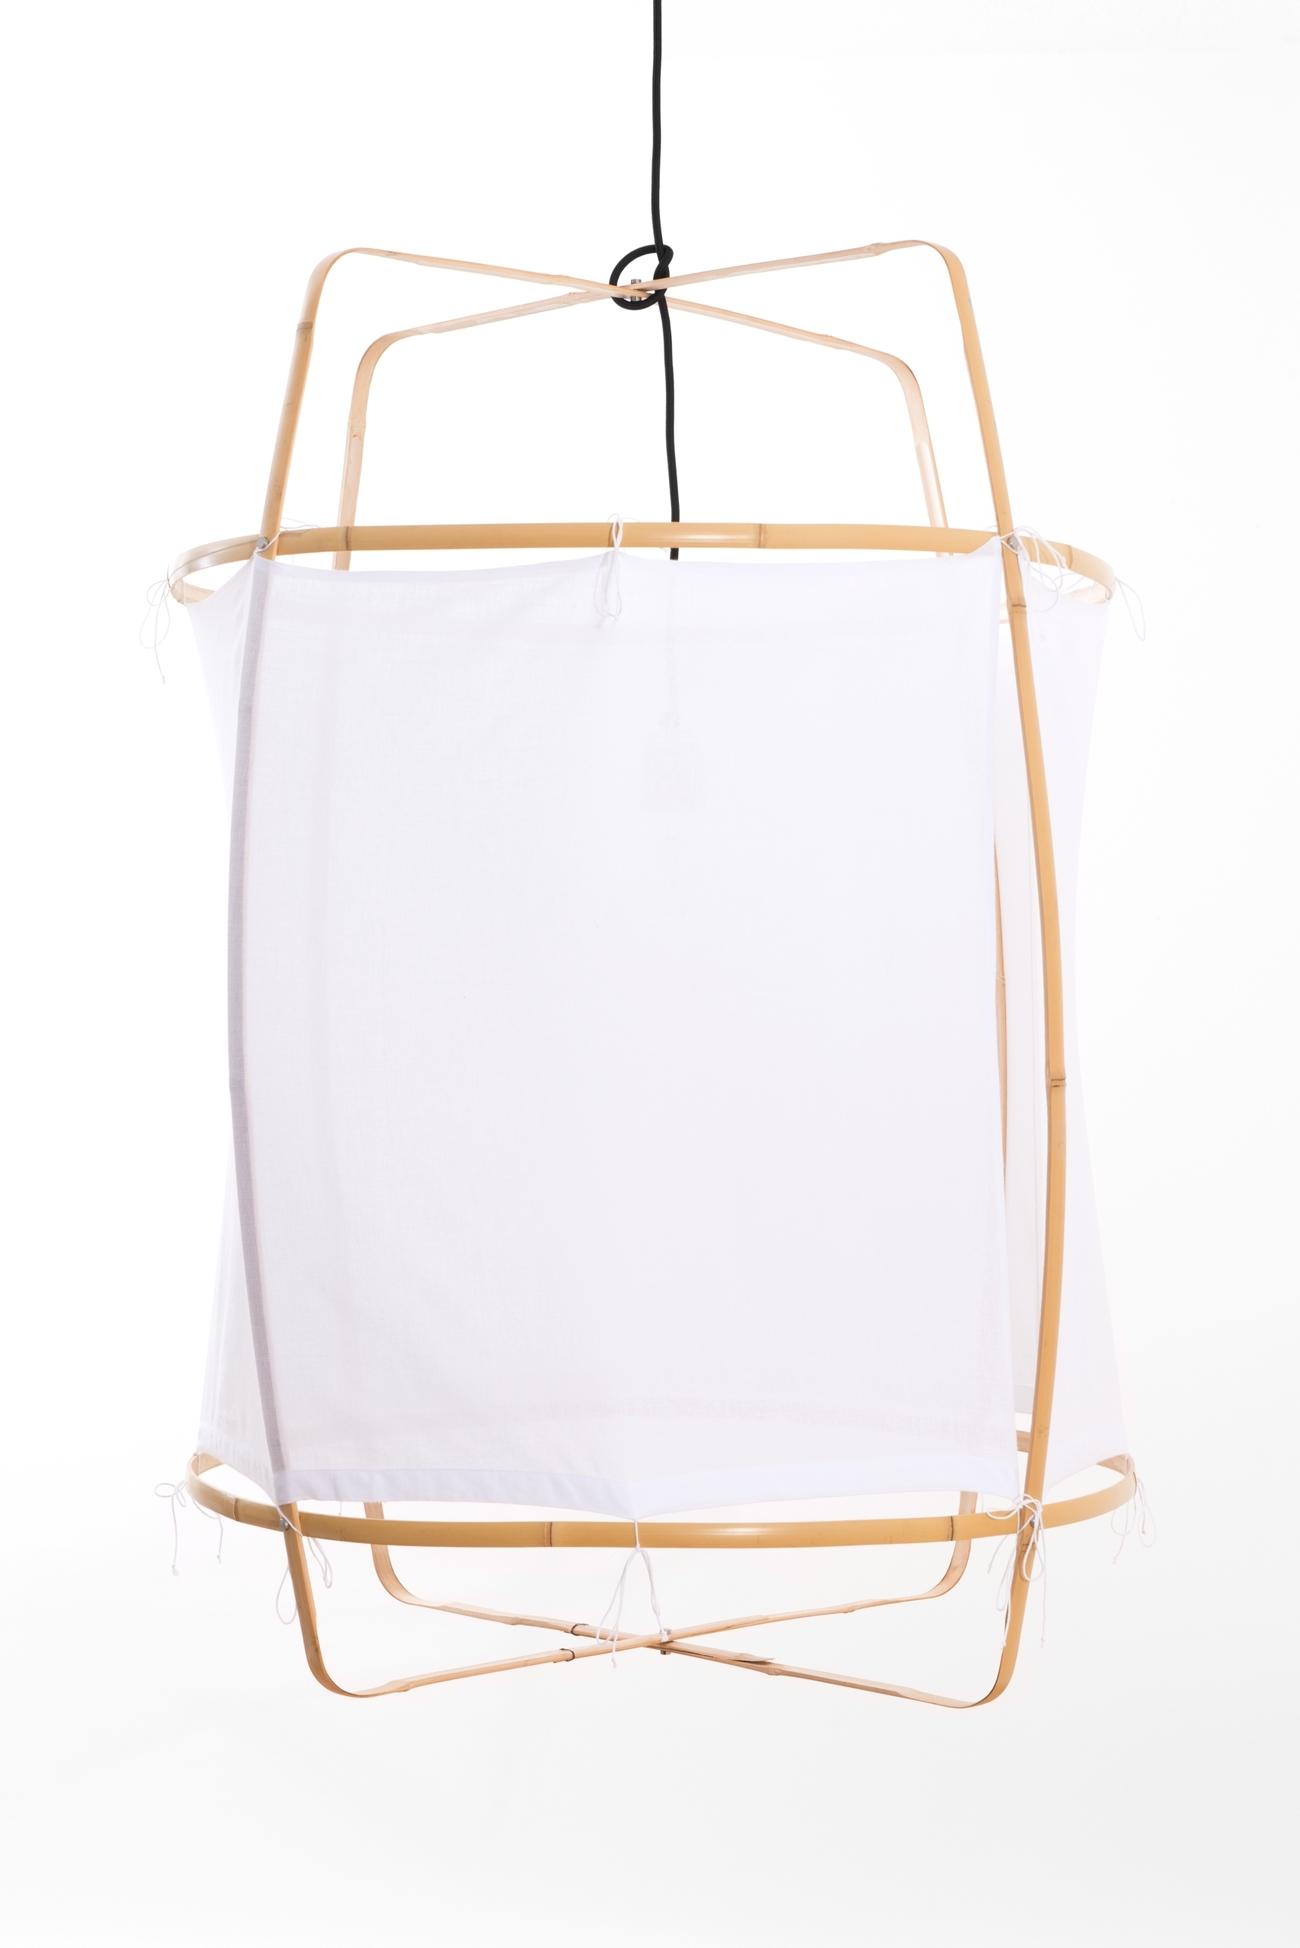 Ay illuminate Z2 Blonde Cotton hanglamp